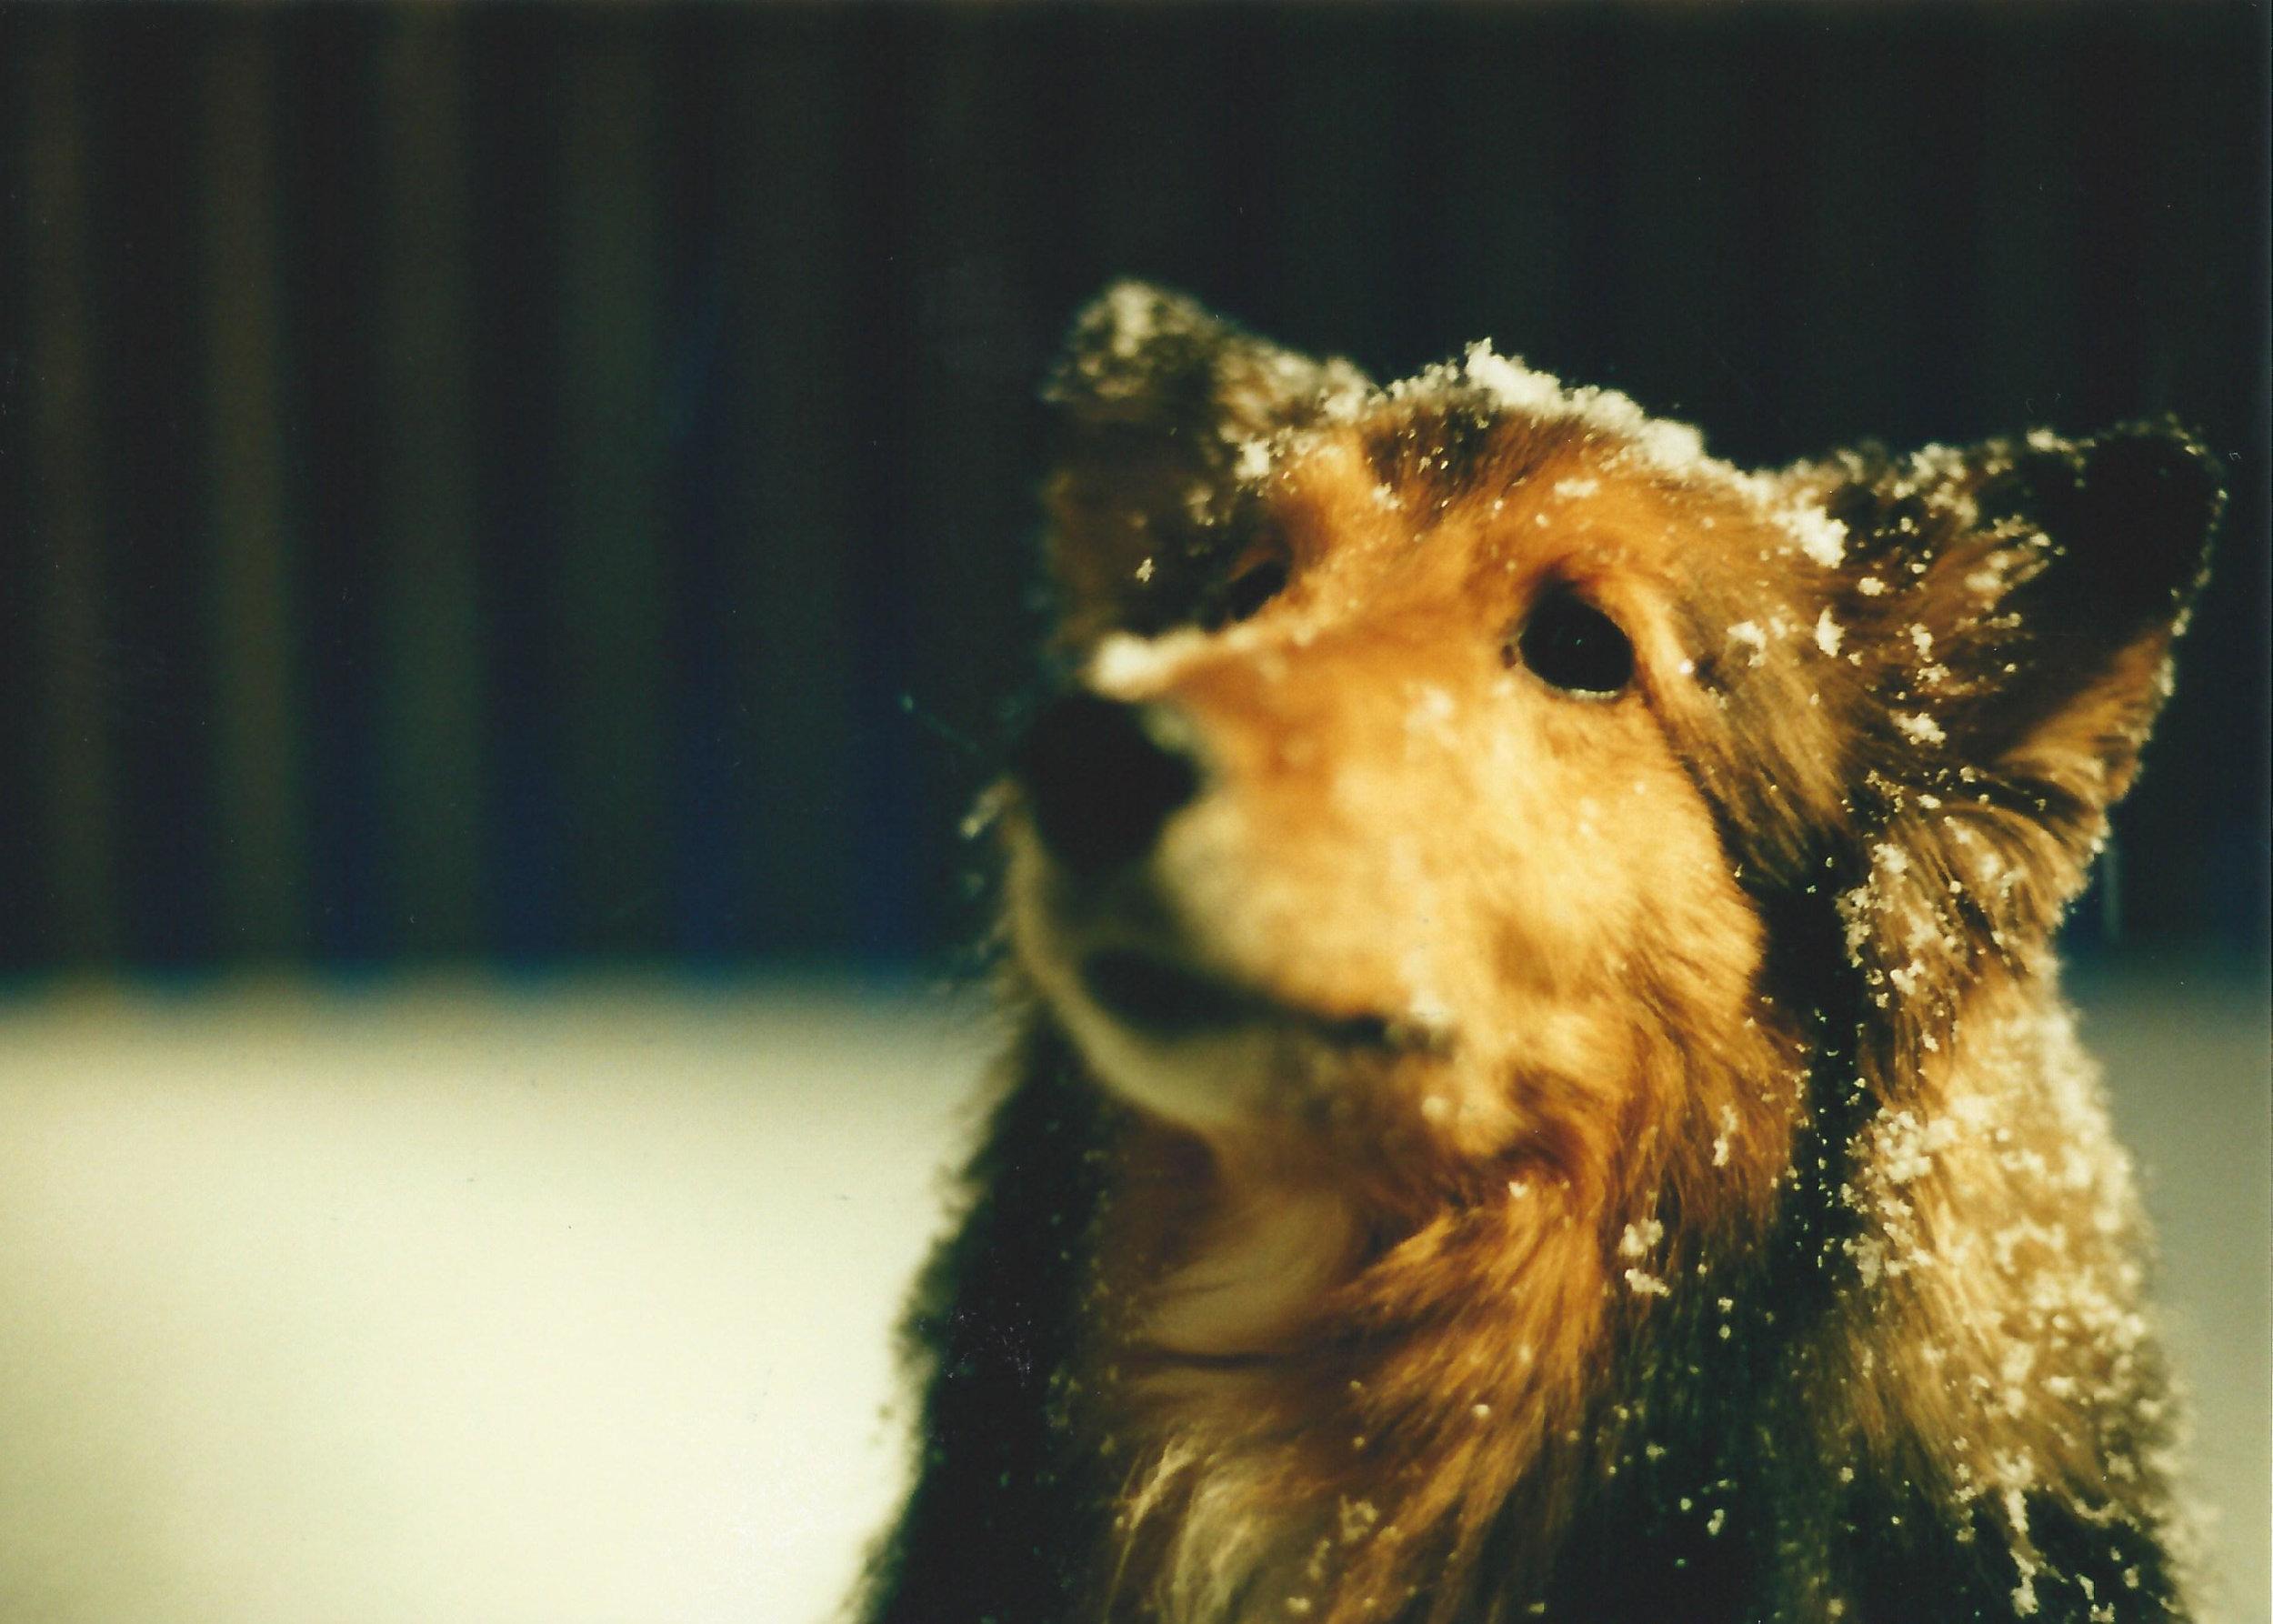 God, I miss that dog. This one still hurts.